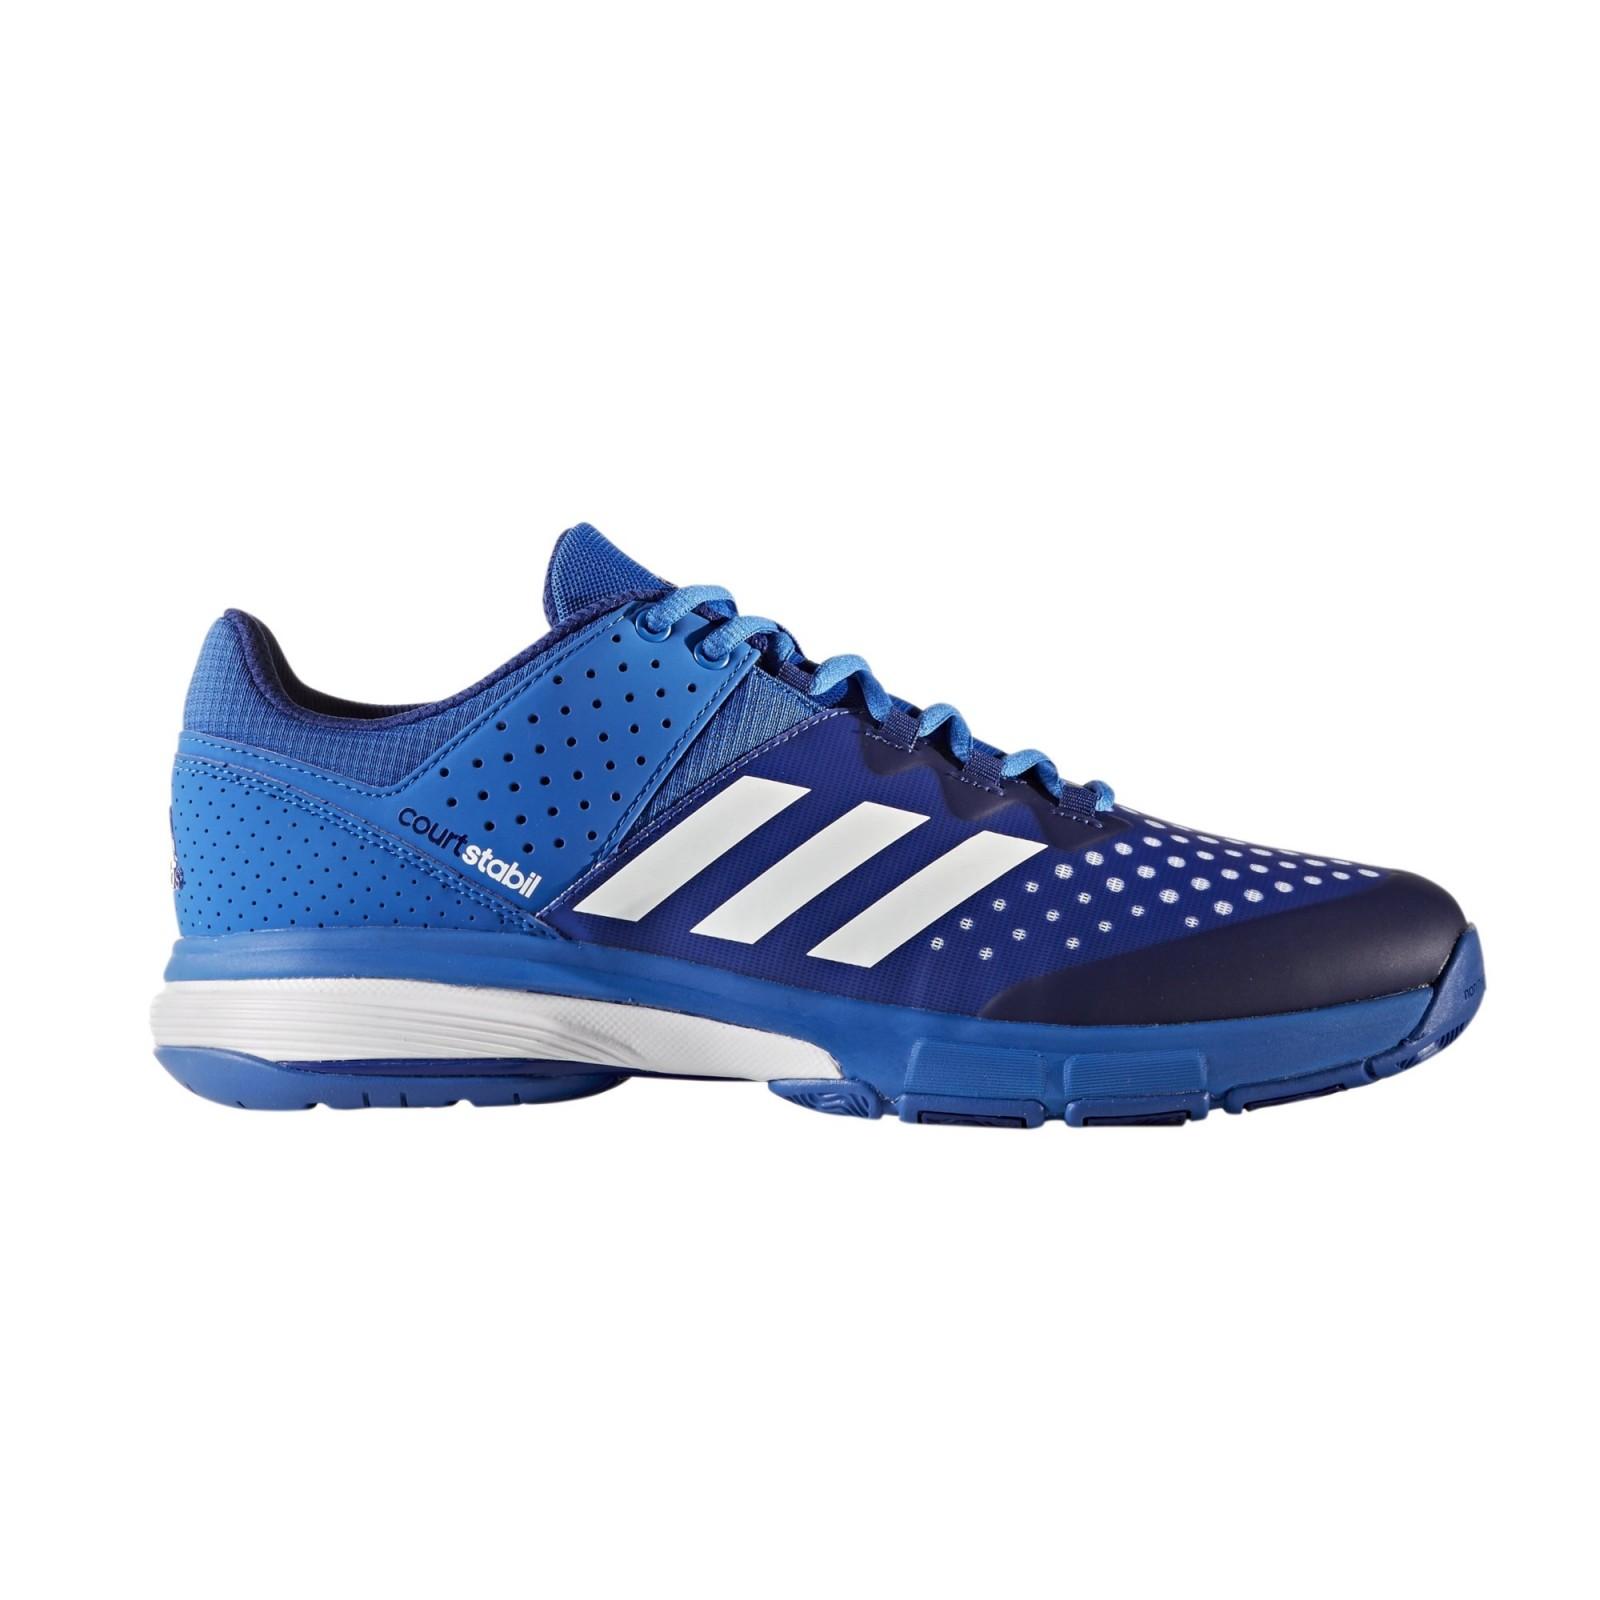 Pánské sálové boty adidas Performance COURT STABIL  3a255ce5b1